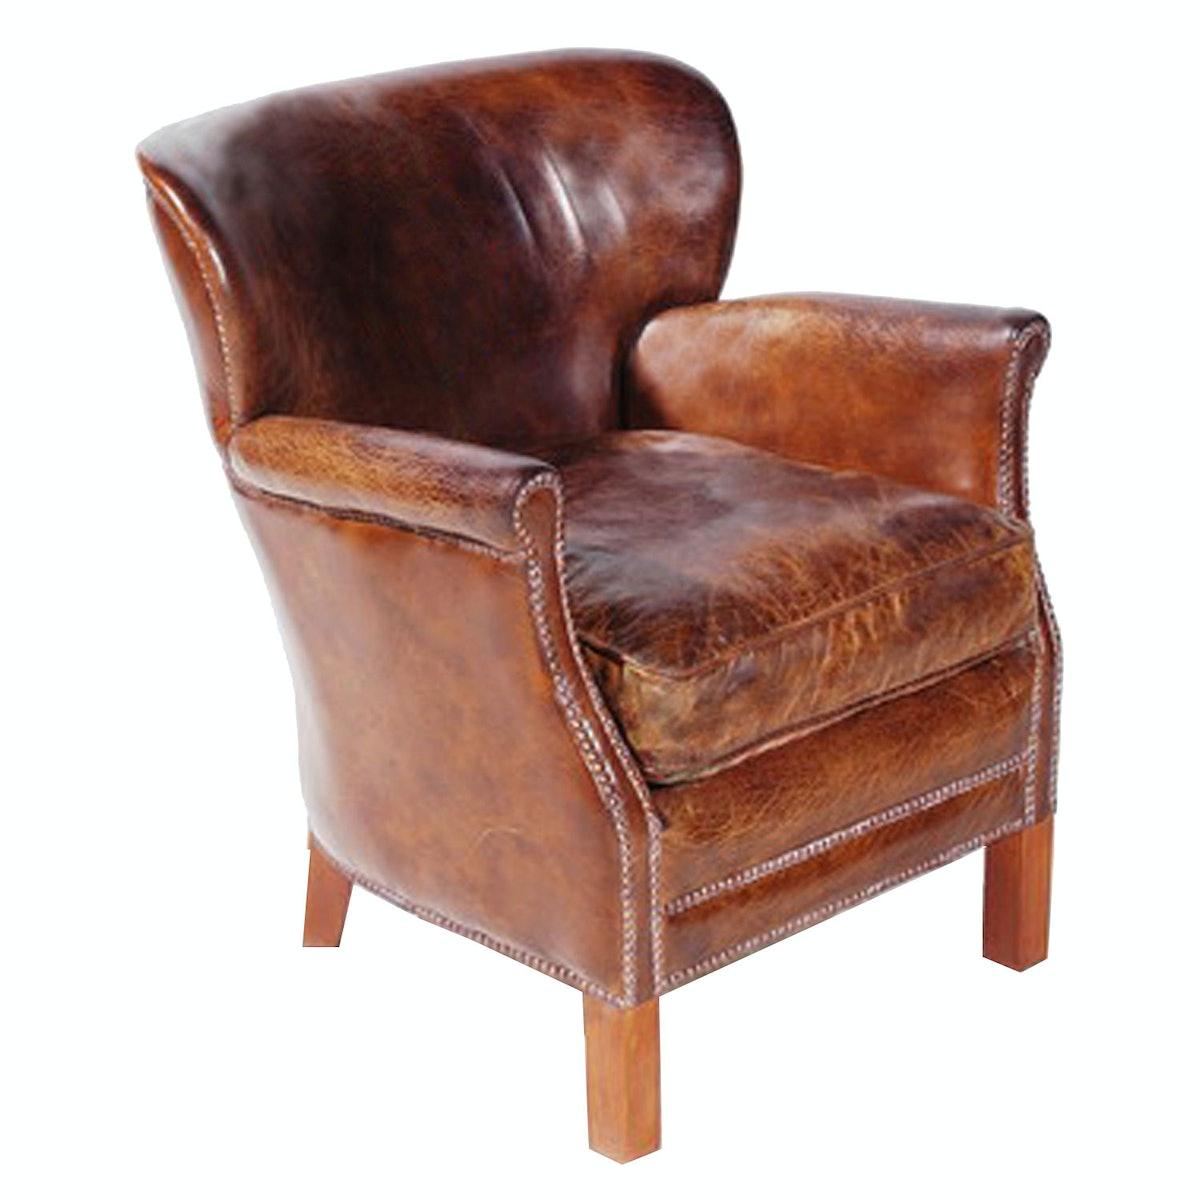 Timothy Oulton armchair, $1,295, Timothy Oulton at ABC Carpet & Home, New York, 646.602.3273.